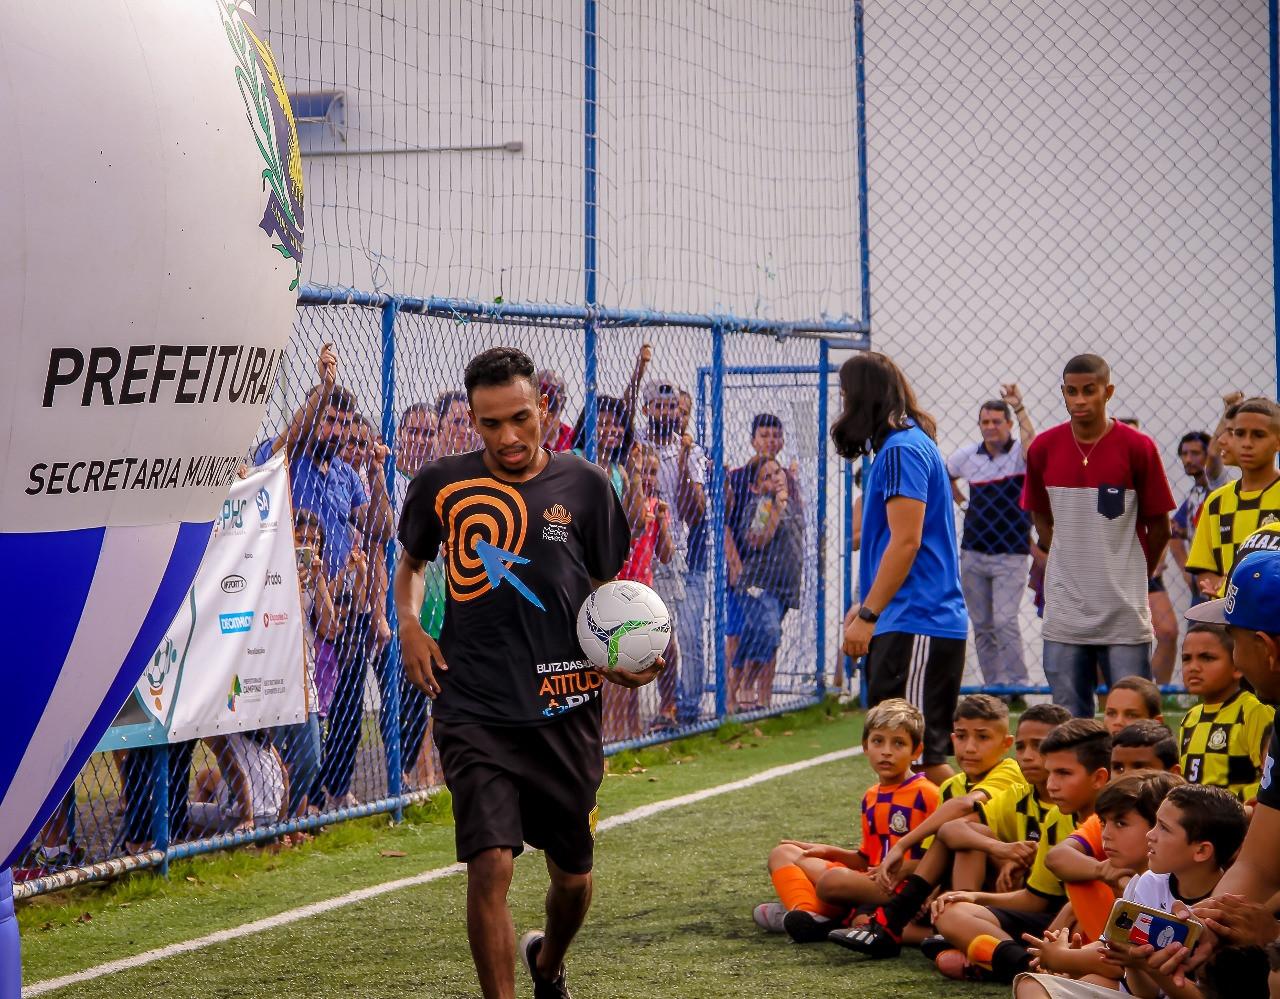 PHOTO-2Copa do Municipal Campinas - Kaluka Futebol Freestyle Campinas019-07-12-16-17-57.jpg